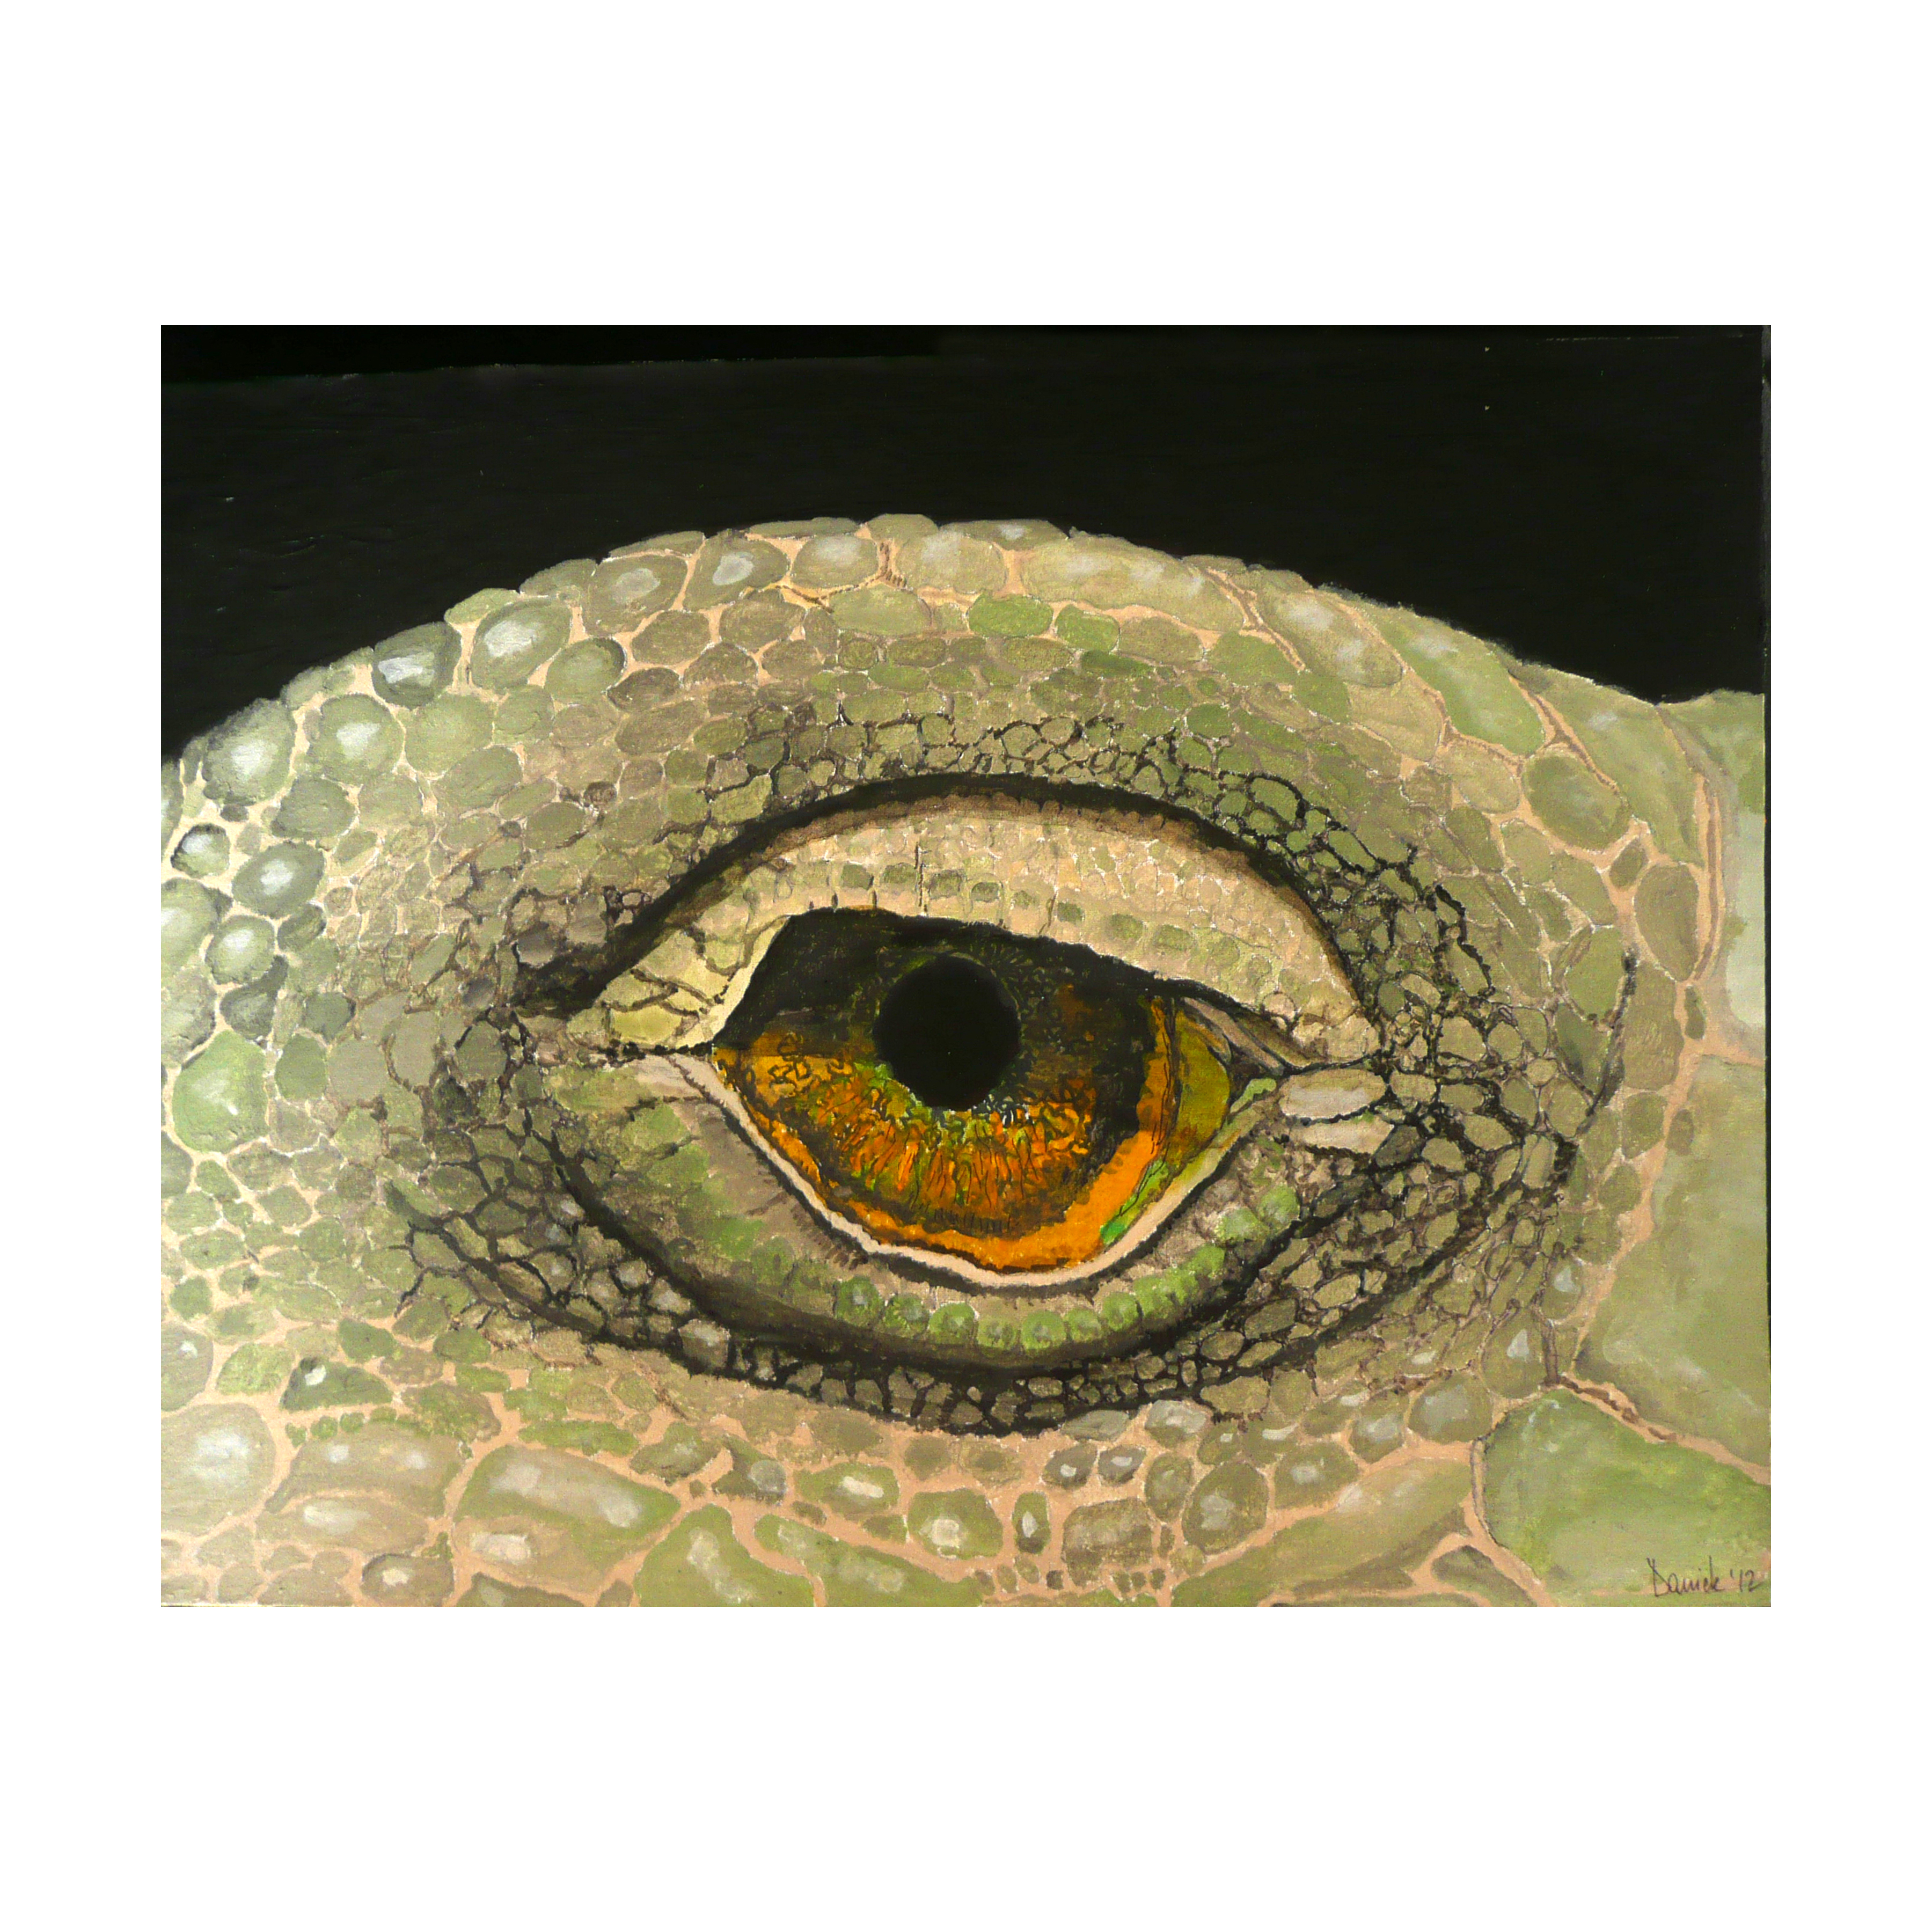 c 8 L'occhio dell Iguana, 2012, Acrilic on canvas tablet.